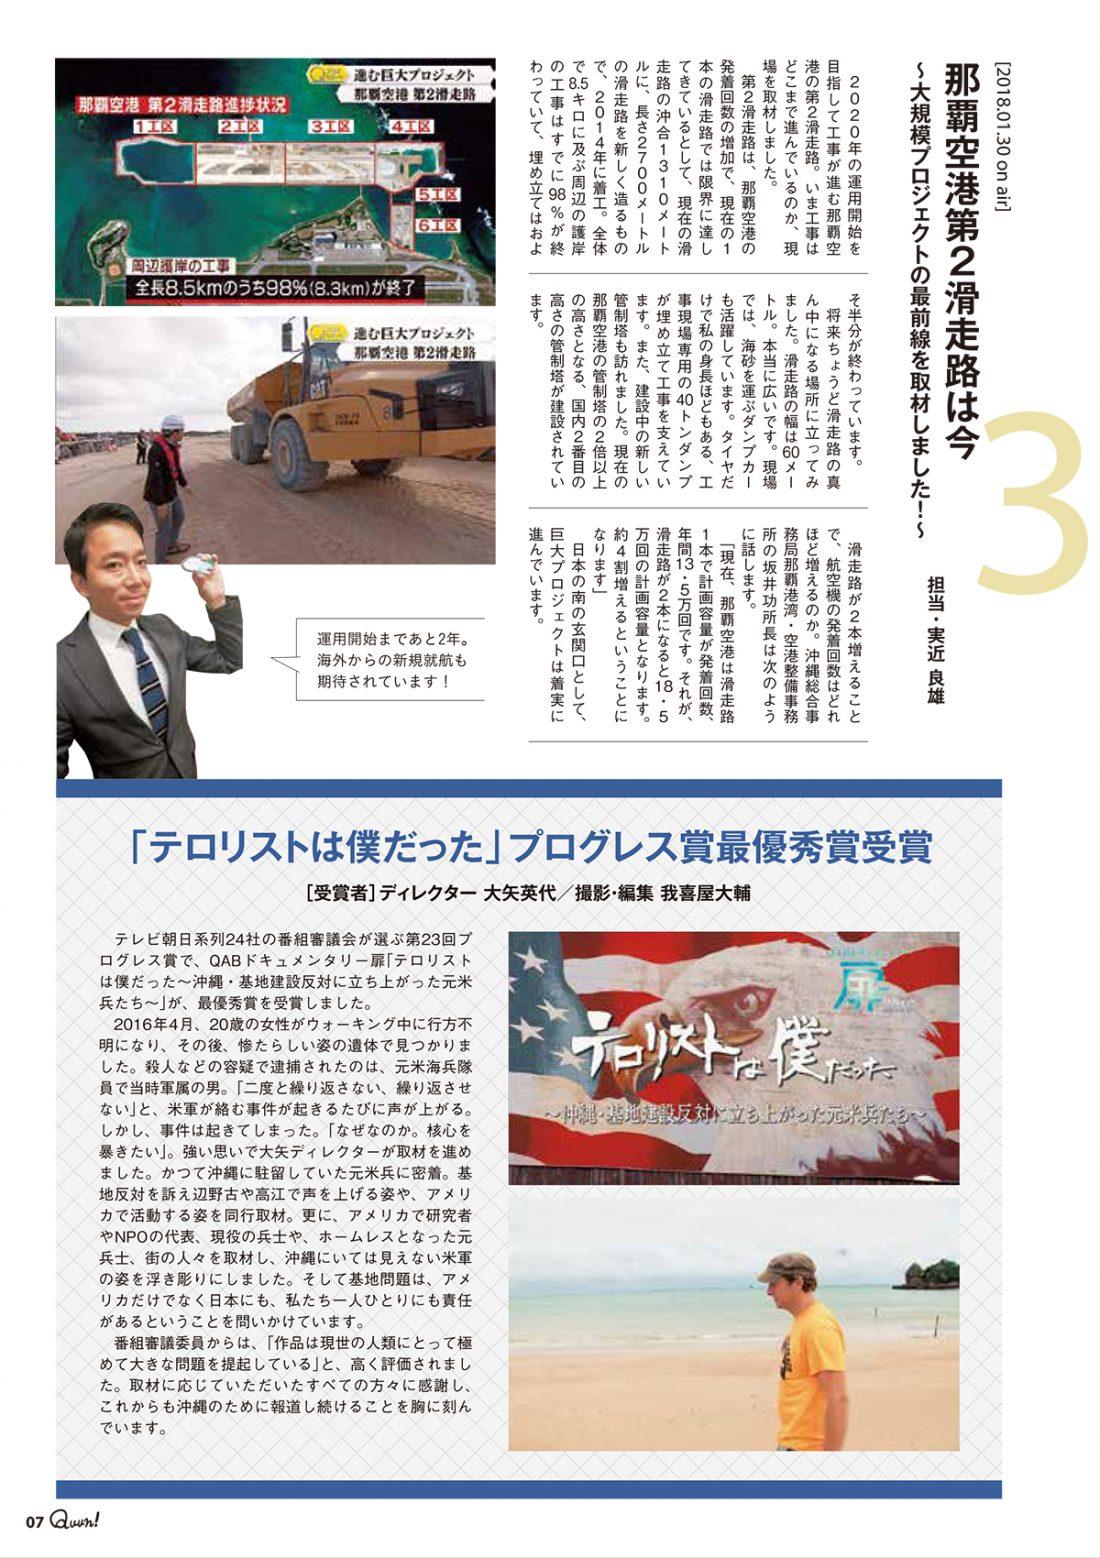 https://www.qab.co.jp/qgoro/wp-content/uploads/quun_0909-1100x1558.jpg